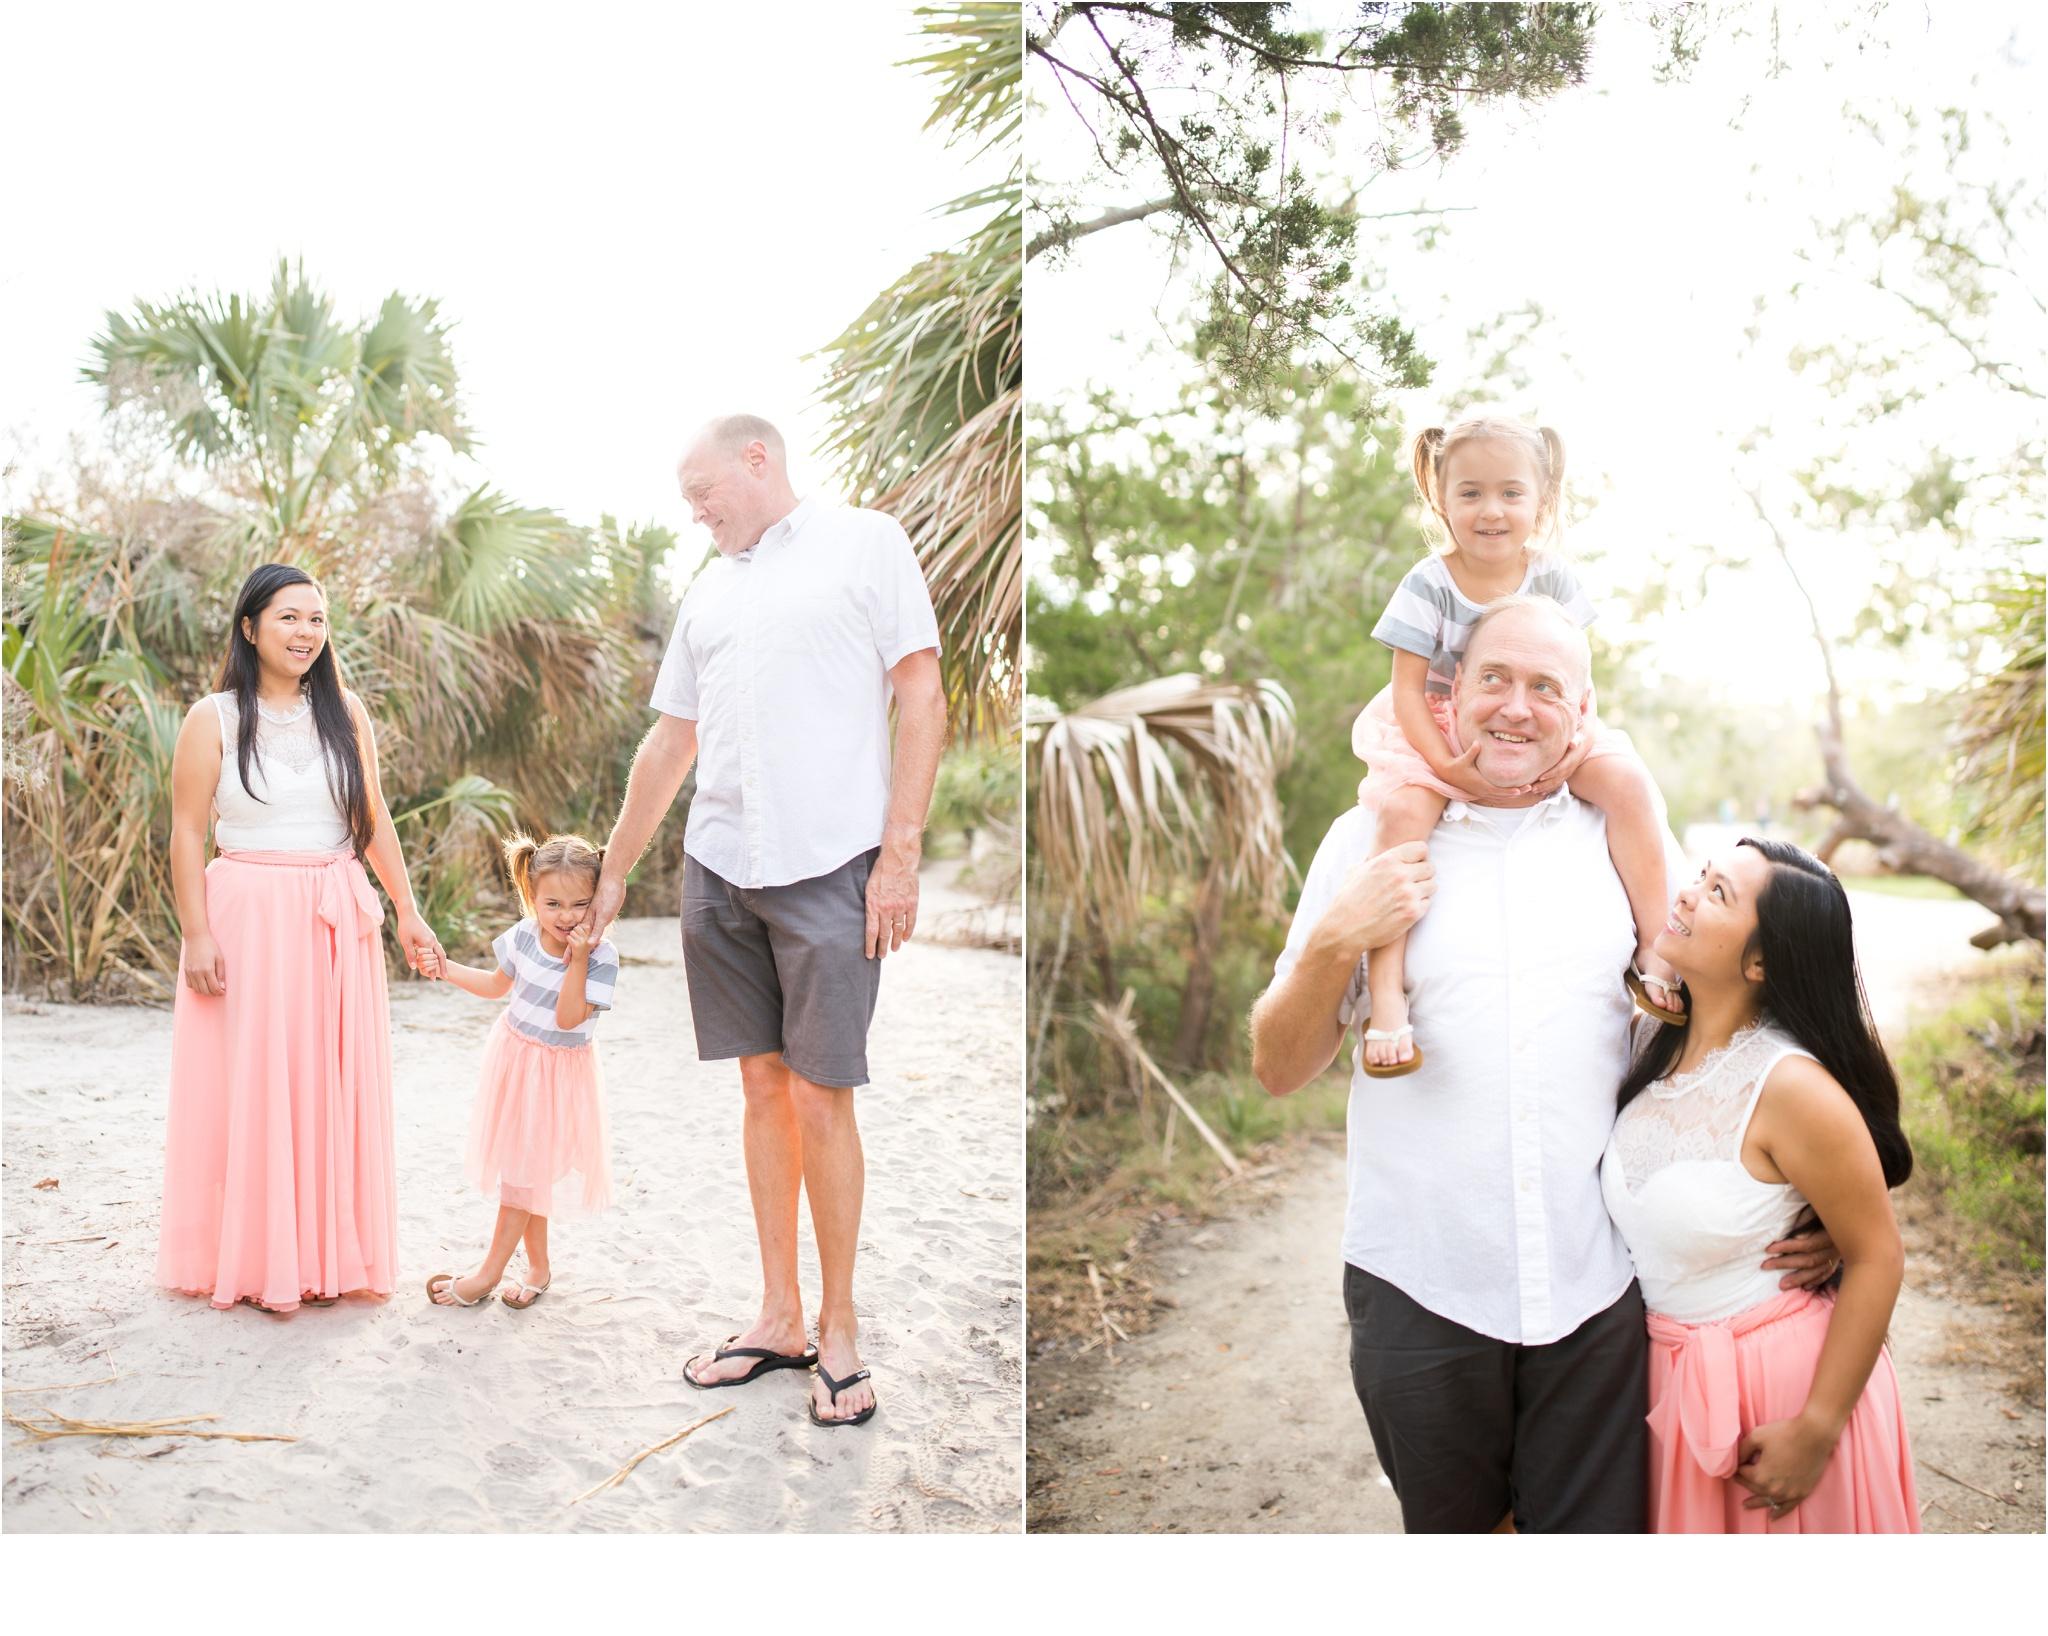 Rainey_Gregg_Photography_St._Simons_Island_Georgia_California_Wedding_Portrait_Photography_0403.jpg